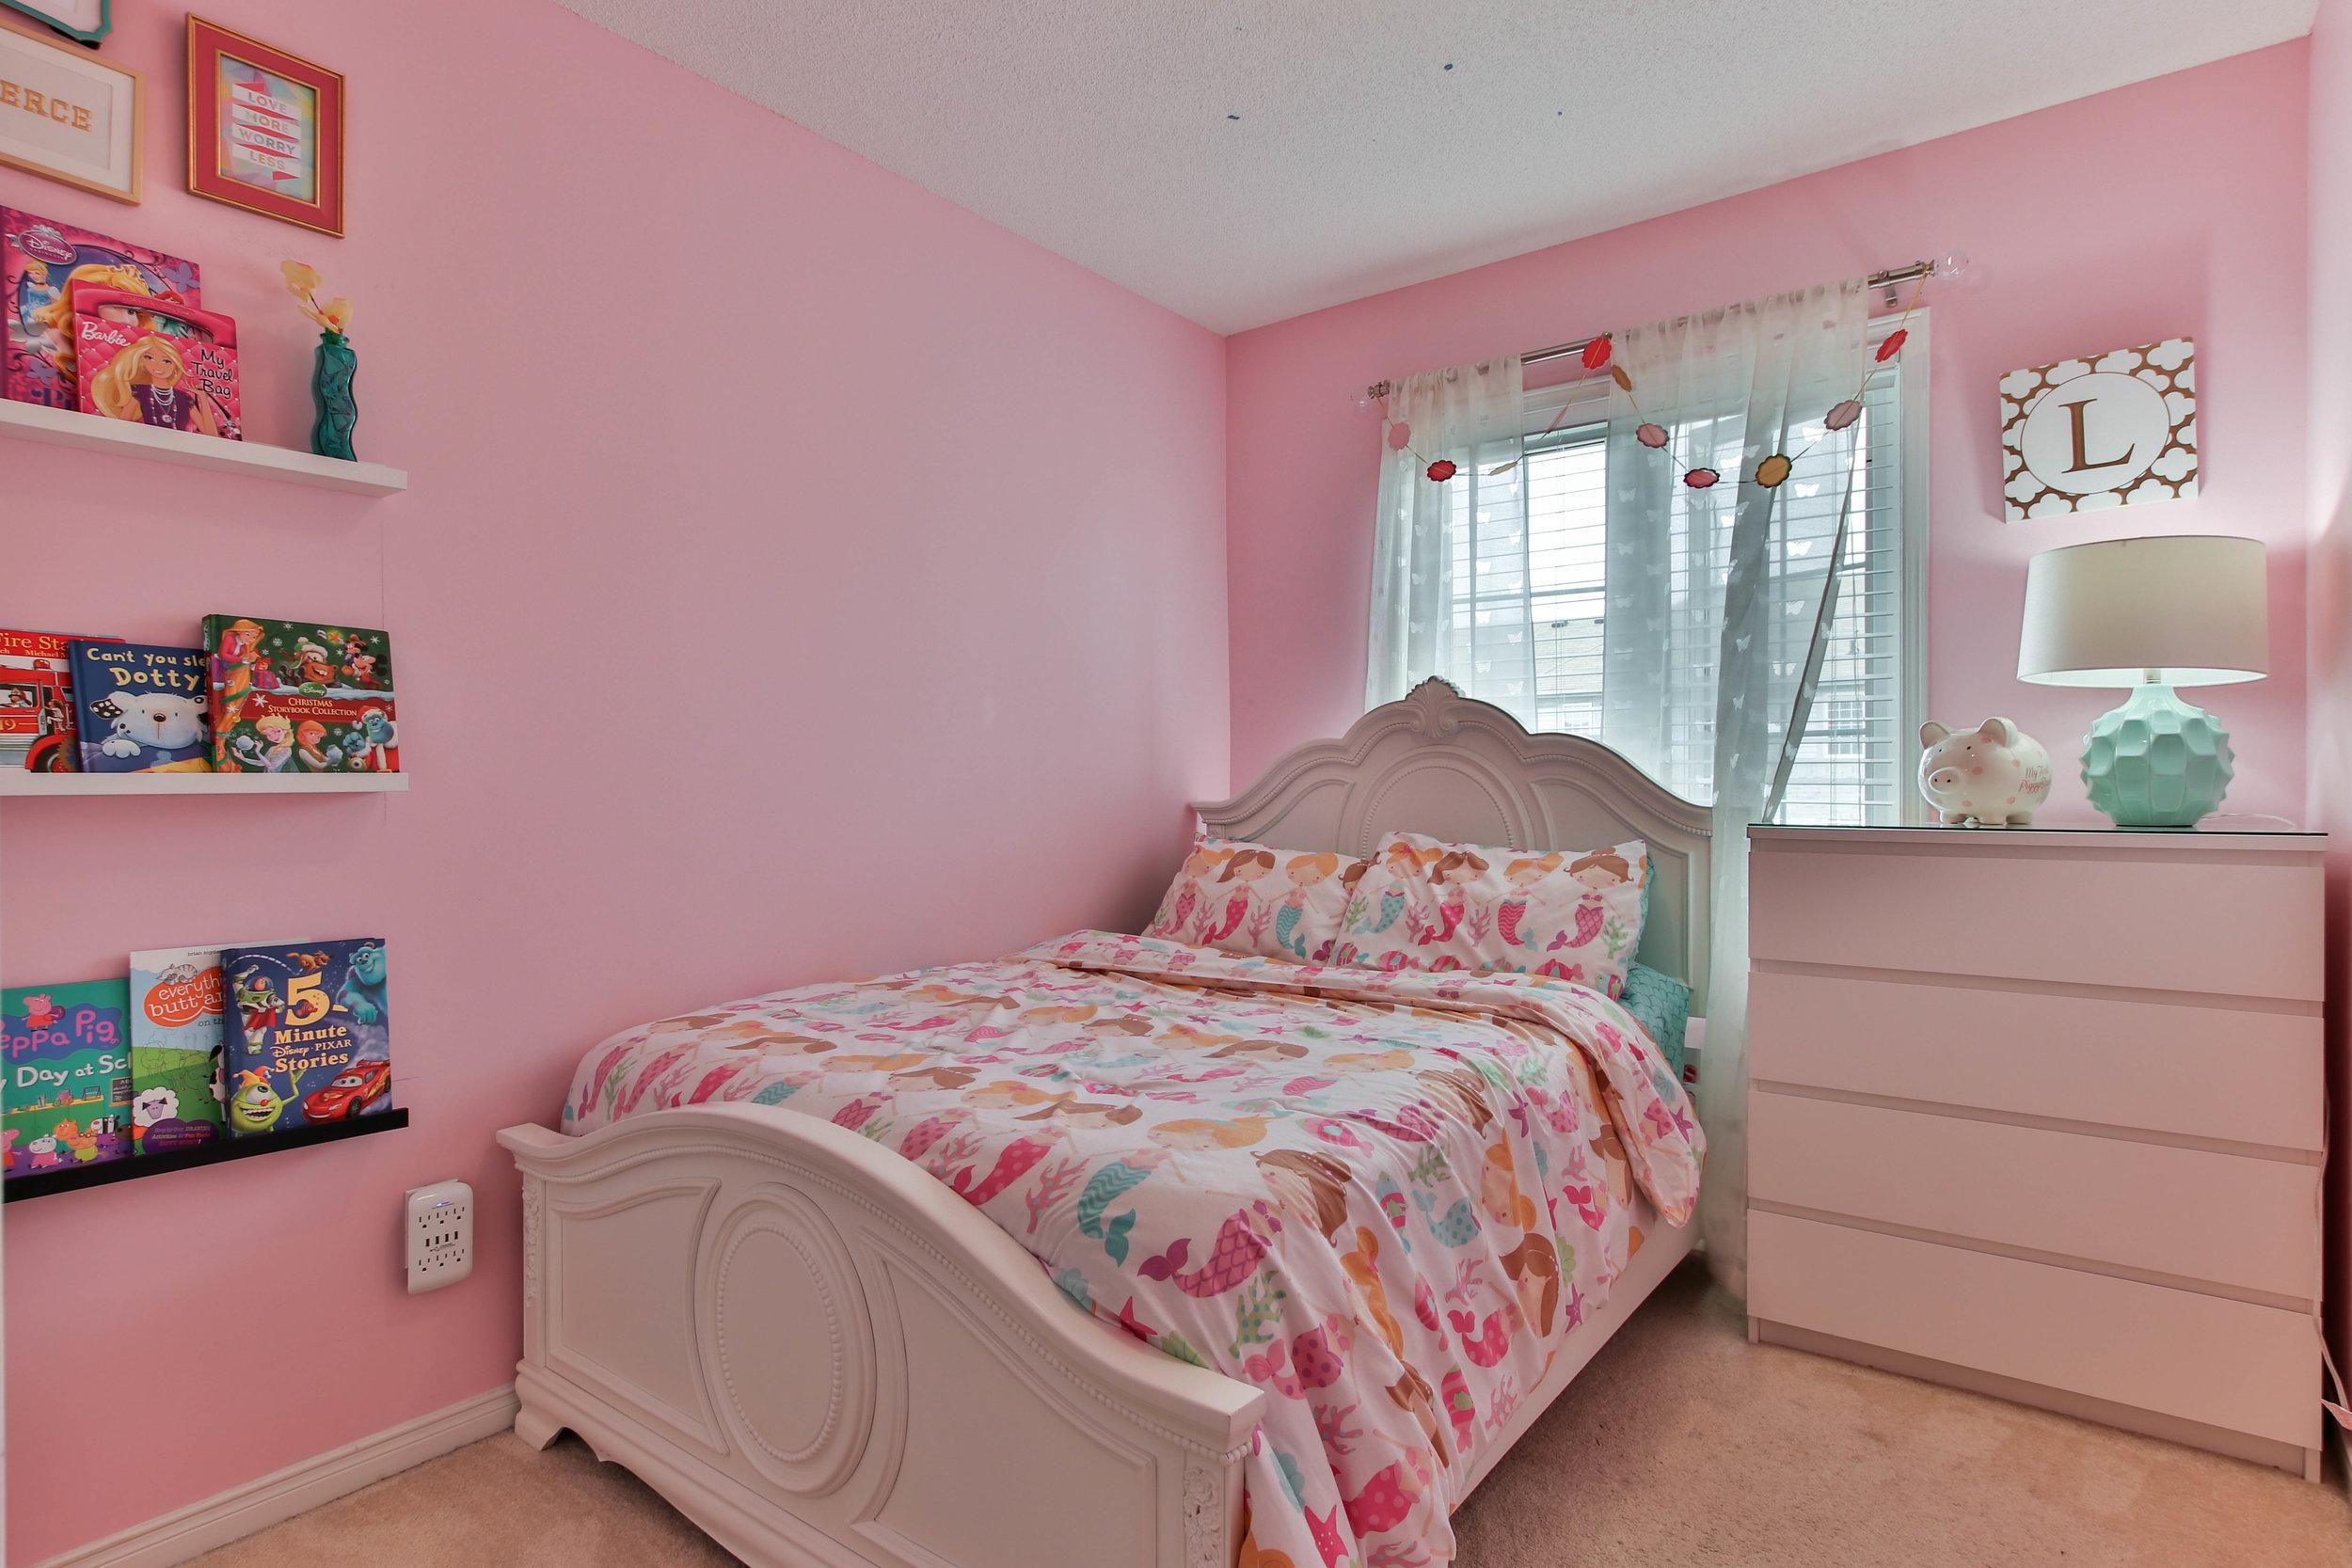 18_Bedroom (1 of 1).jpg